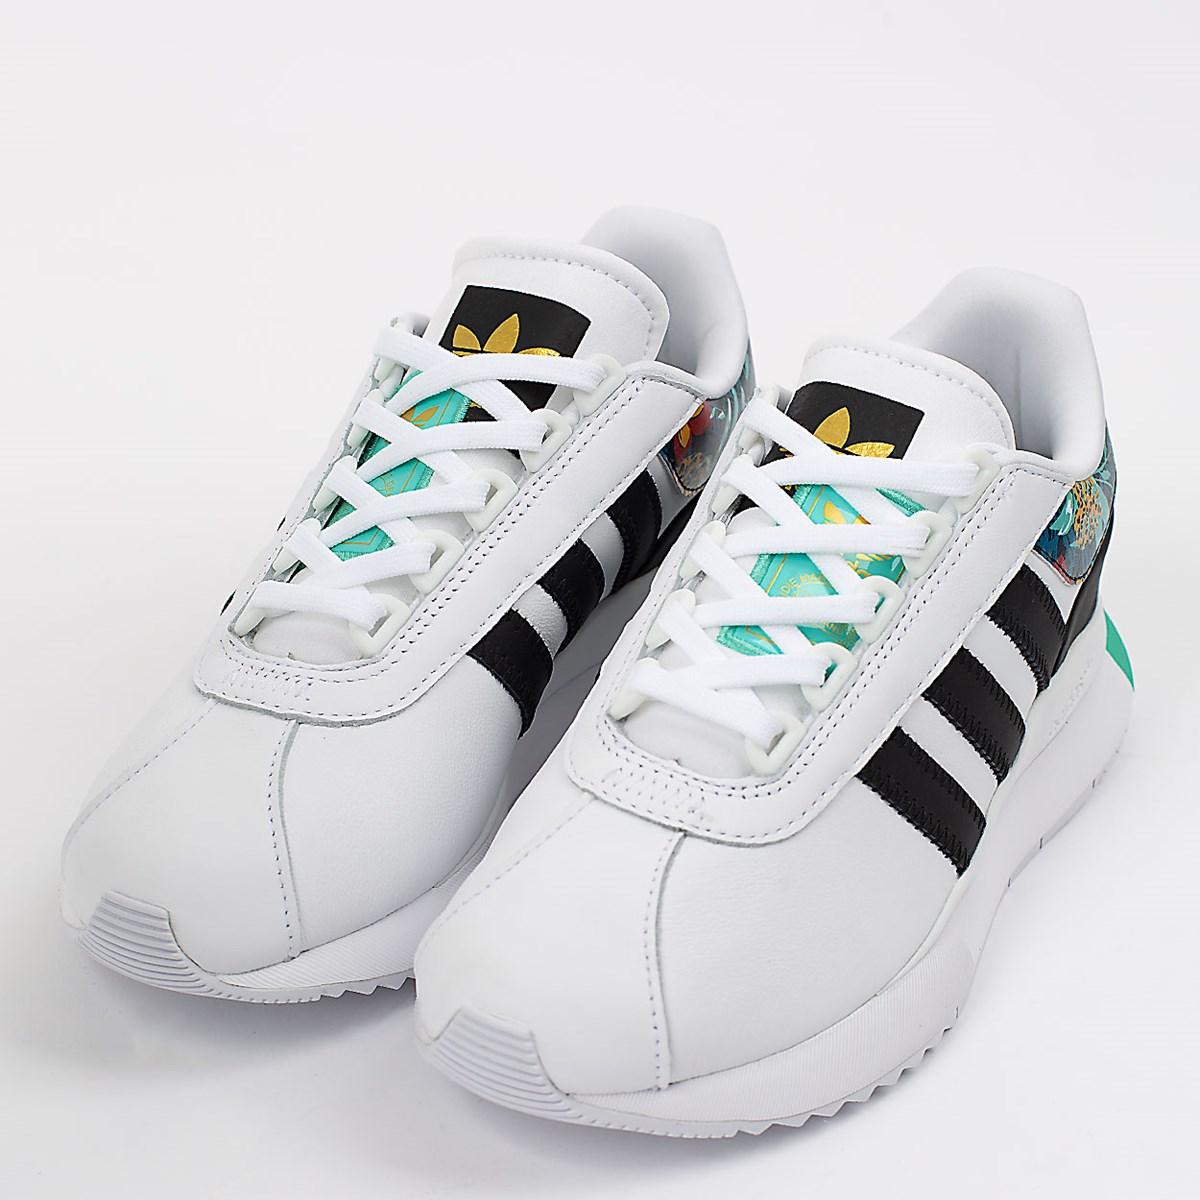 Tênis adidas SL Andridge Cloud White Black FY3658